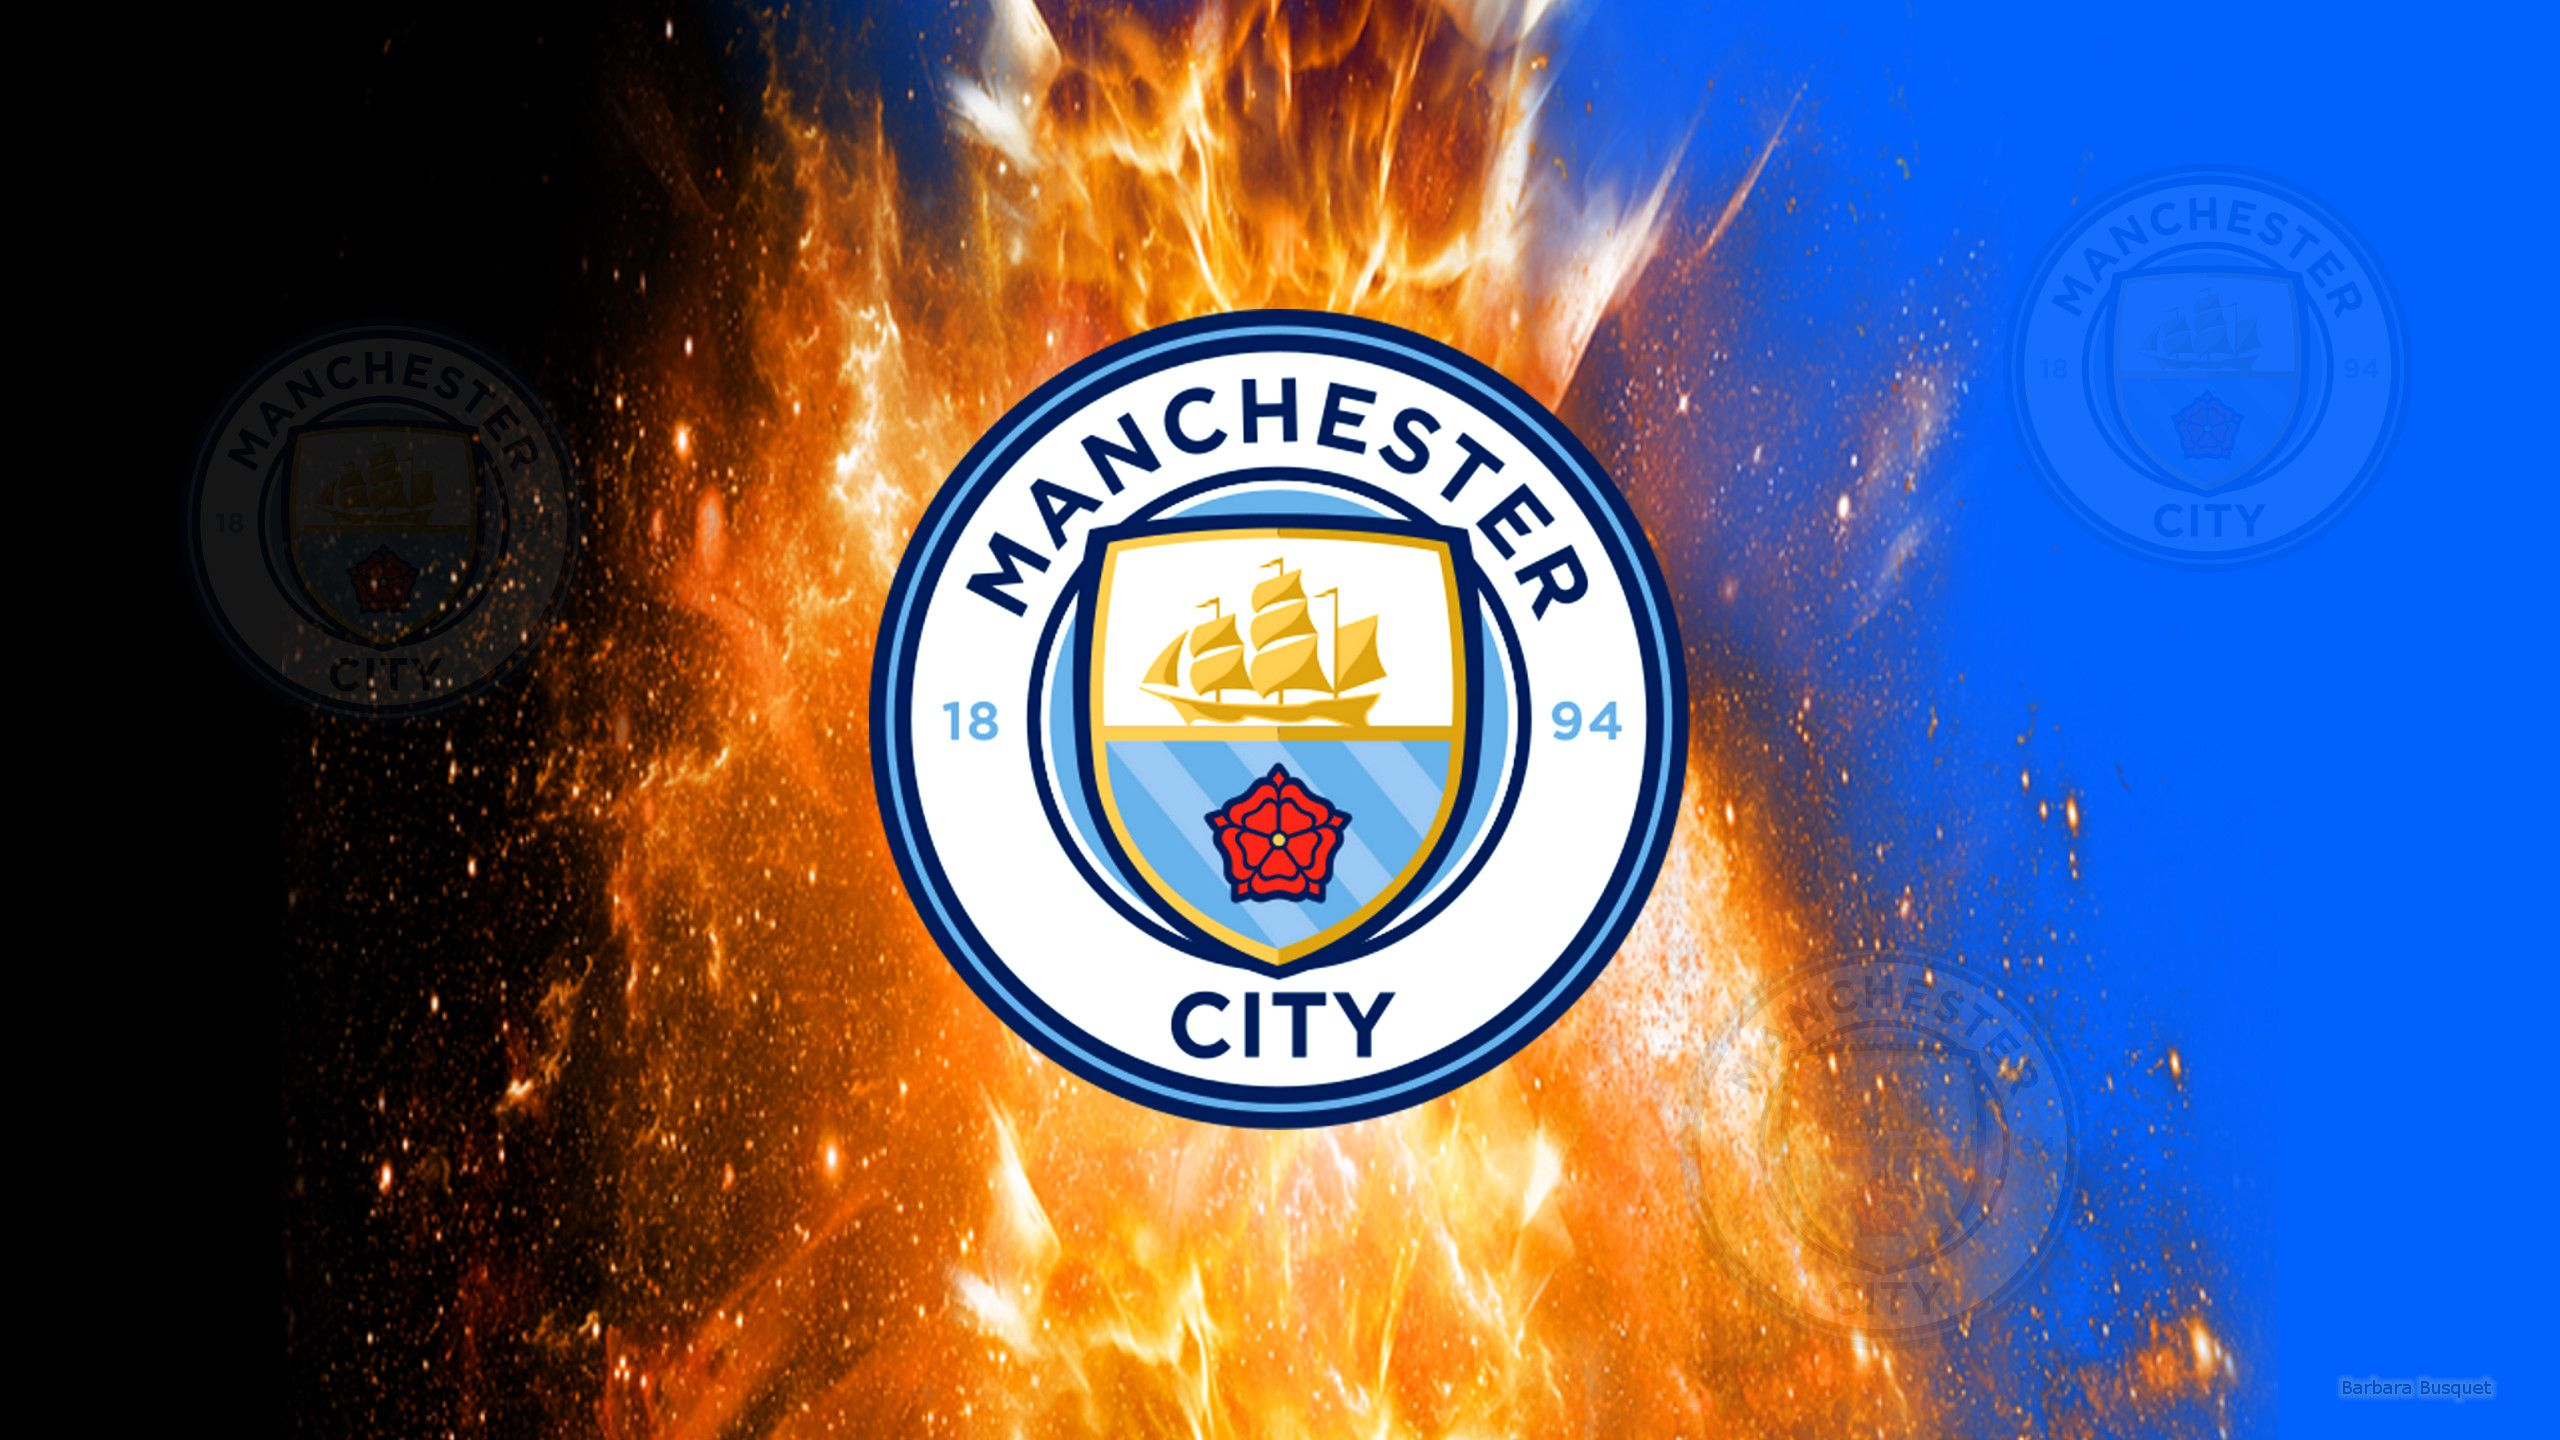 Manchester City Wallpapers Wallpaper Manchester City Wallpaper City Wallpaper Manchester City